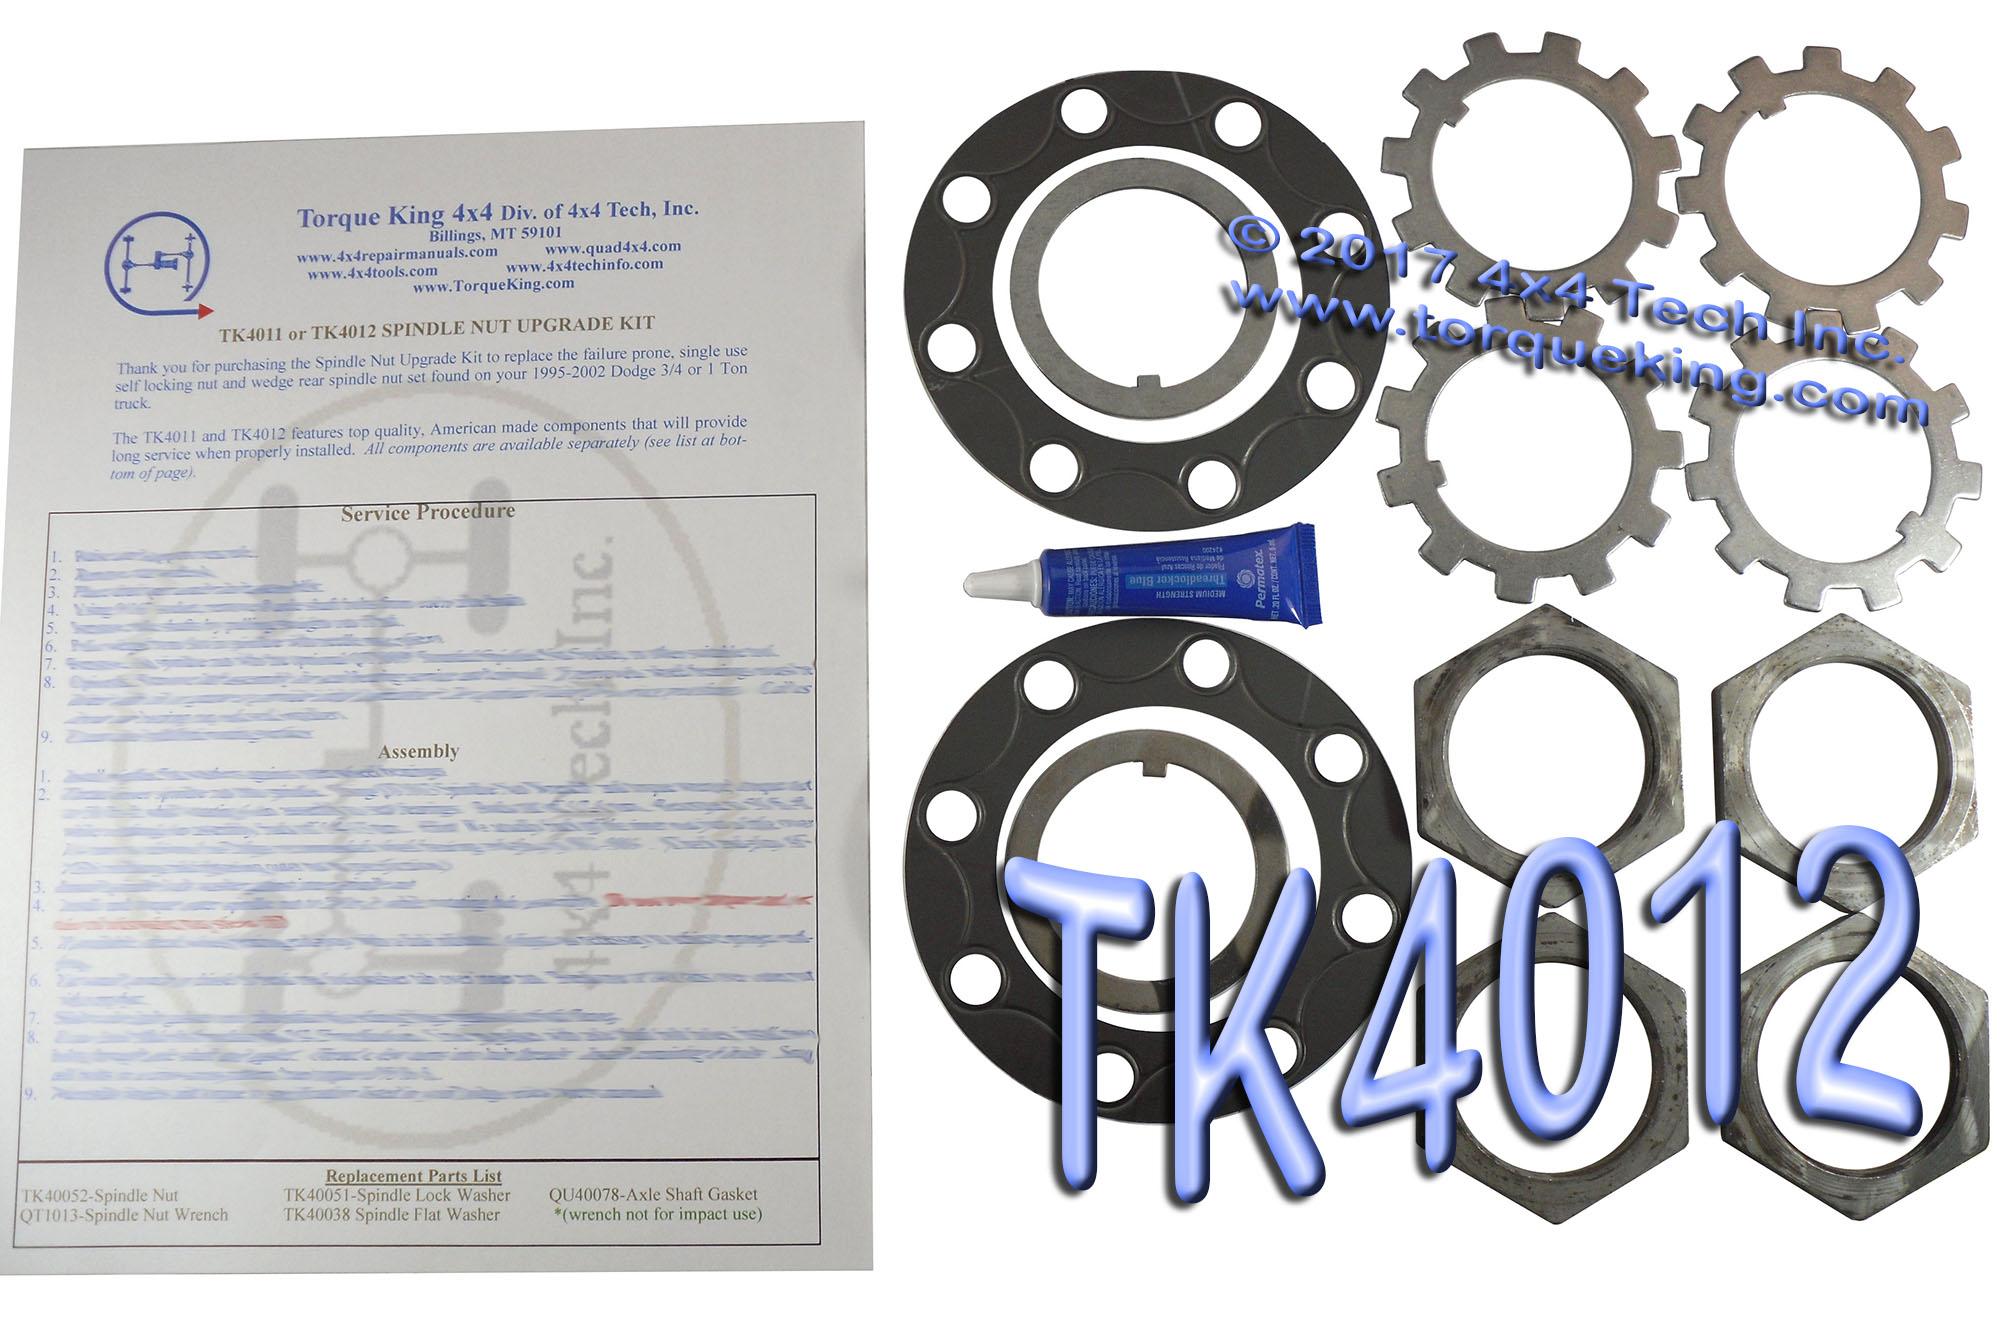 4011 Torque King 4x4. Ford. Ford 1 Ton Dana 80 Diagram At Scoala.co